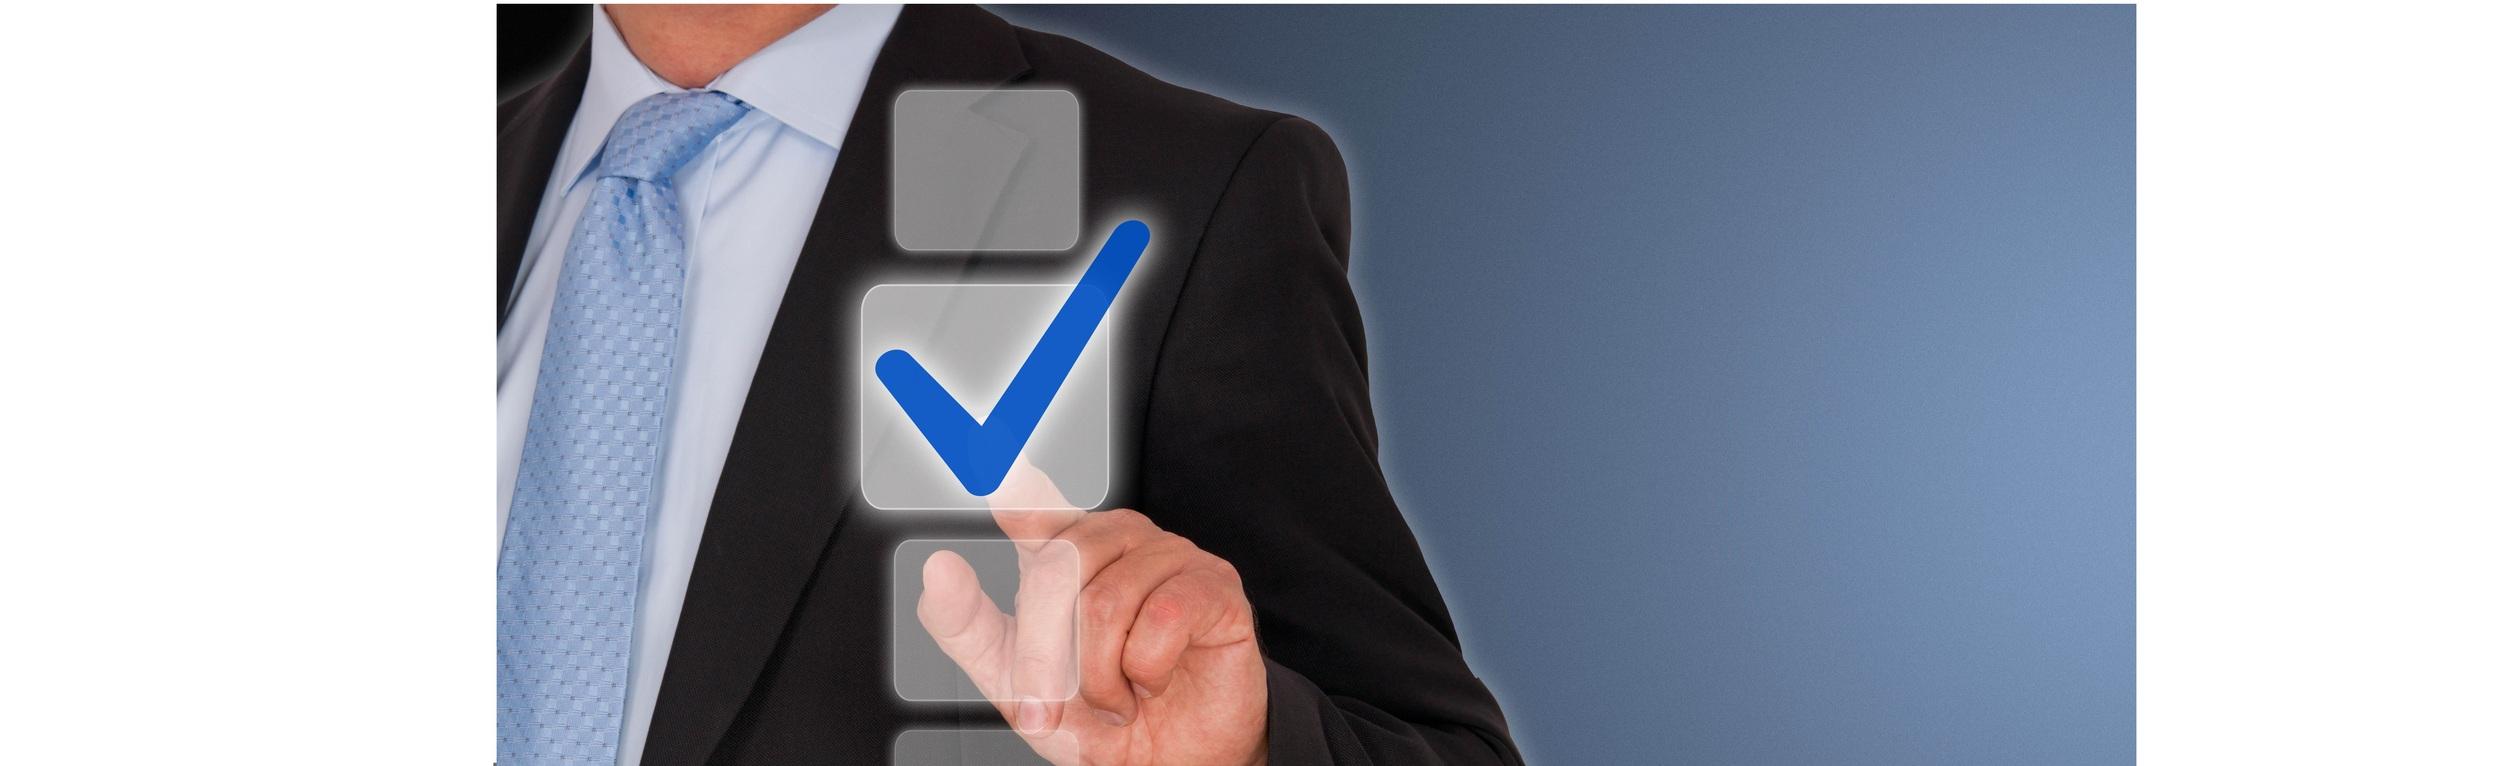 Alta Best Practices Certification Recertification Secure Title